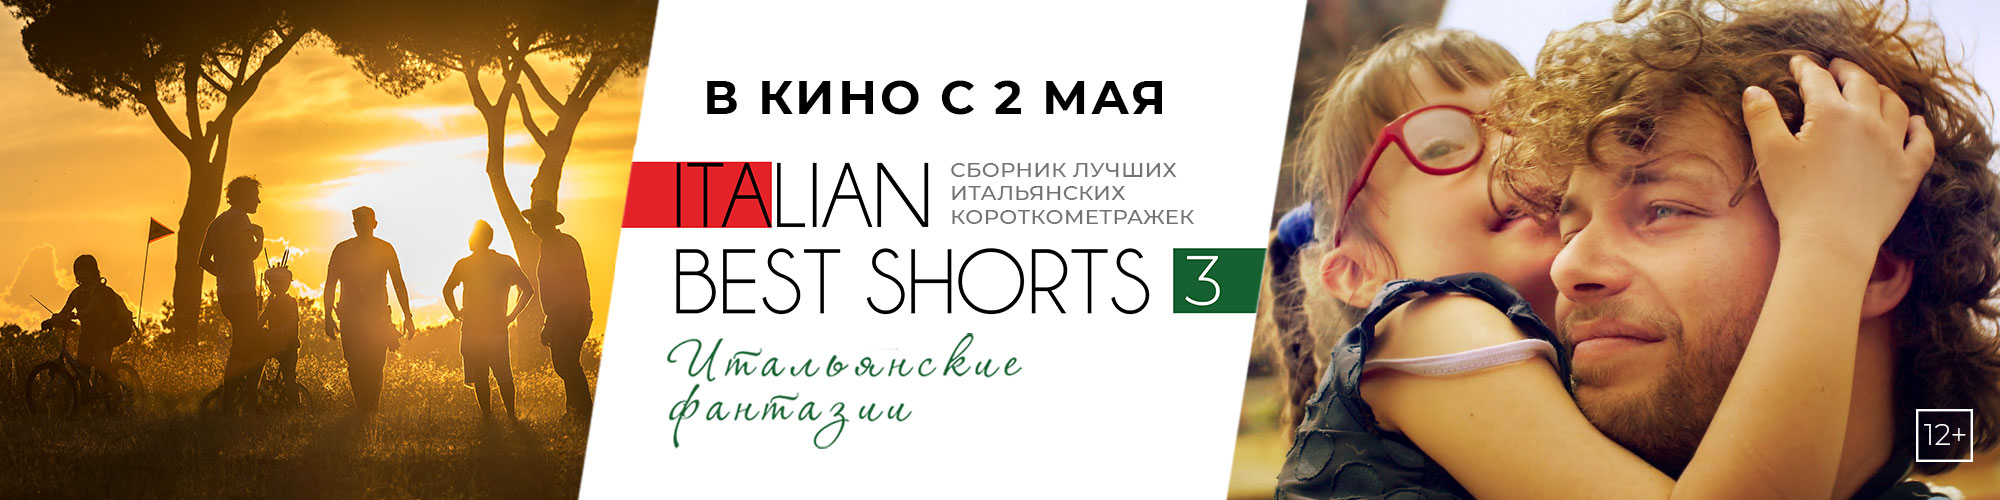 Italian-Shorts-2-КультКино-cultofcinema.com_